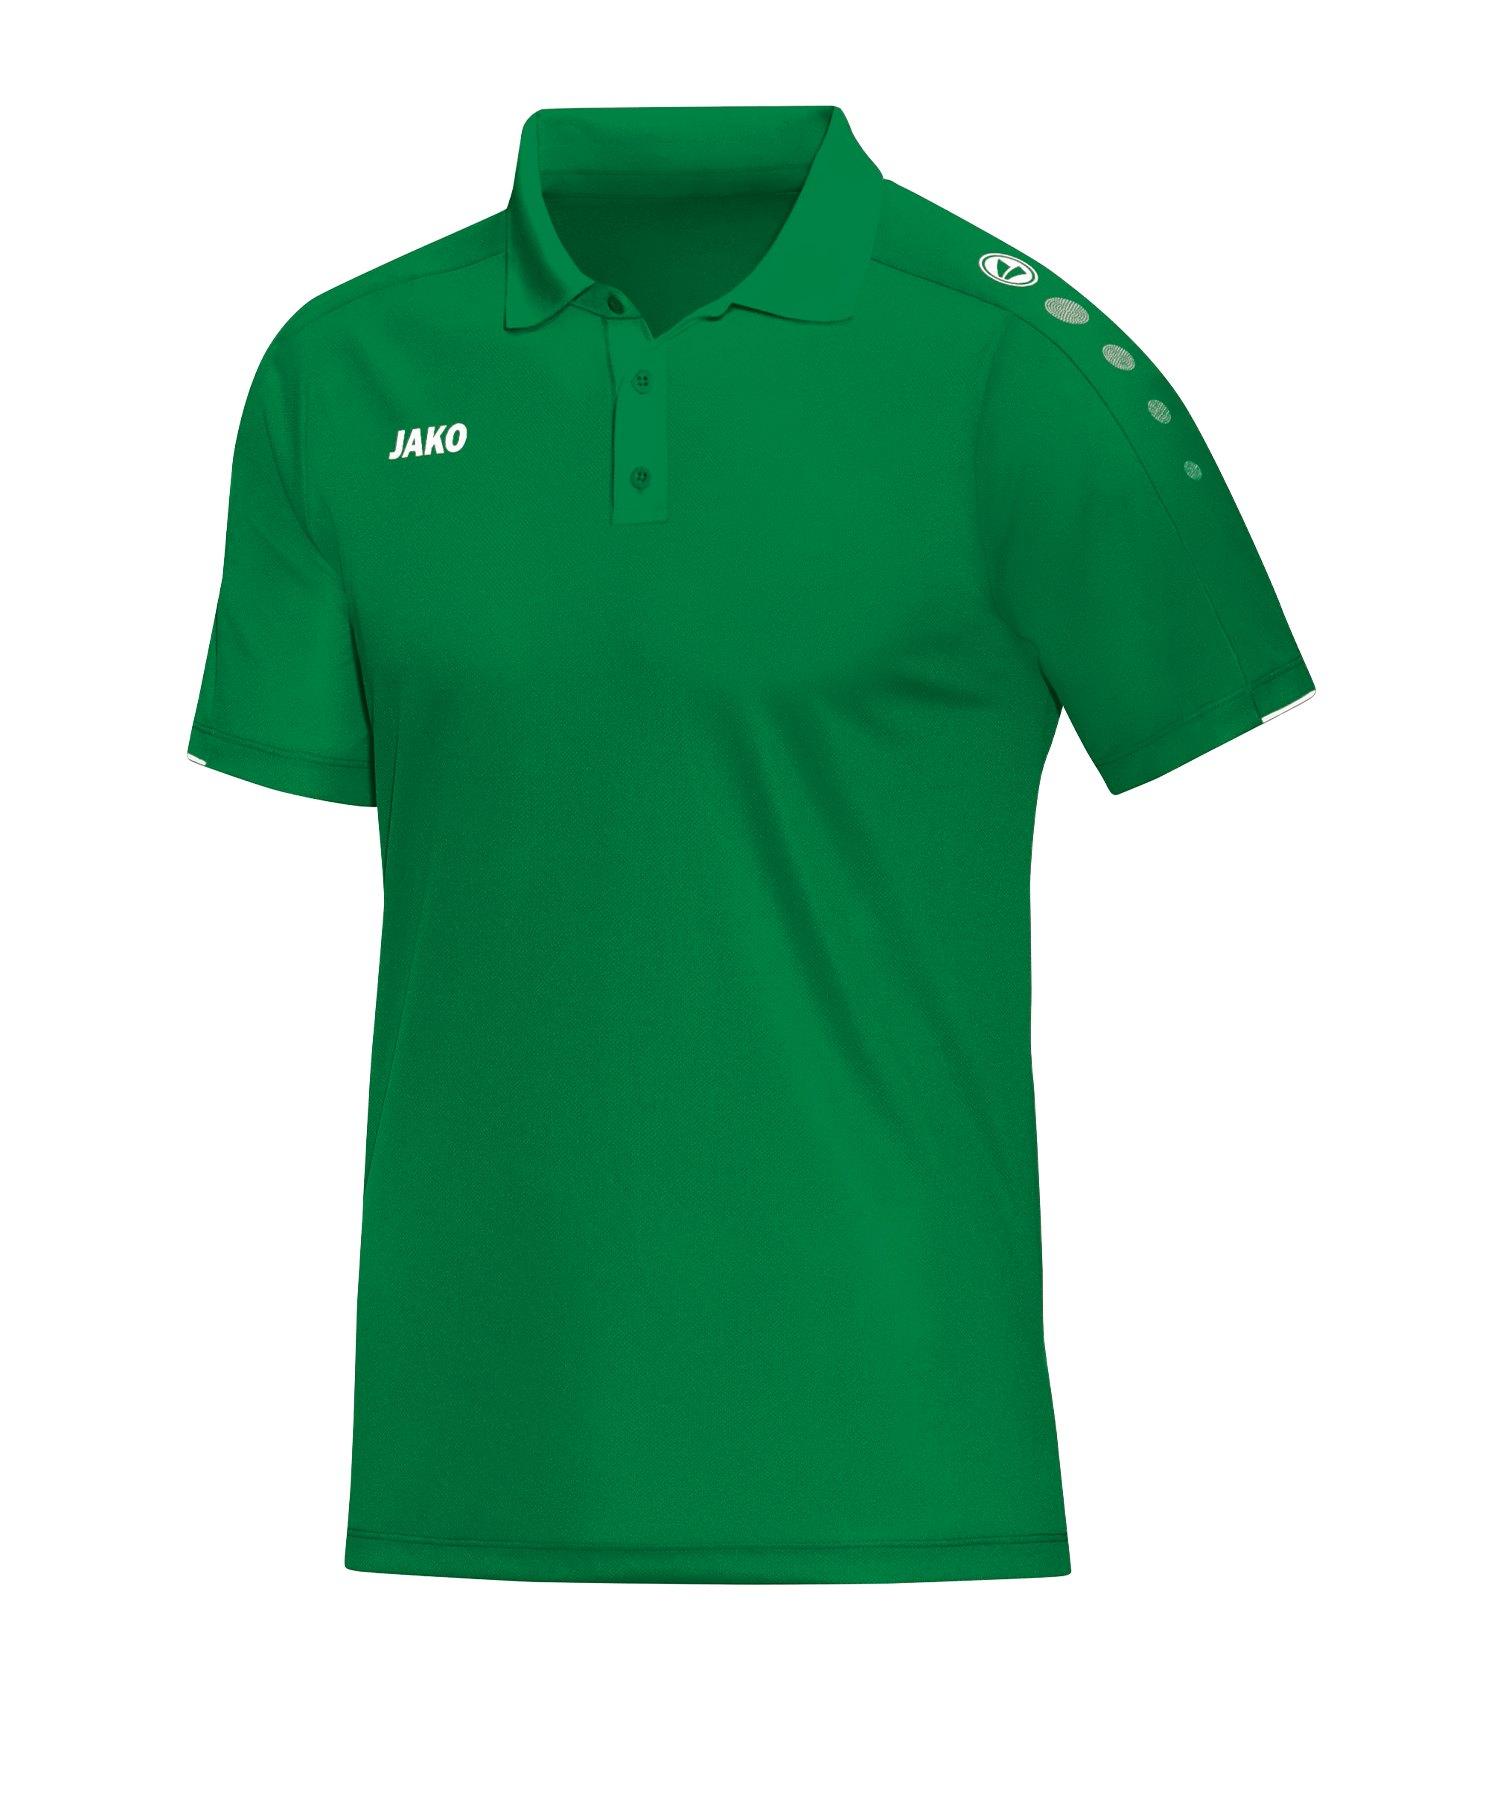 Jako Classico Poloshirt Grün F06 - Gruen